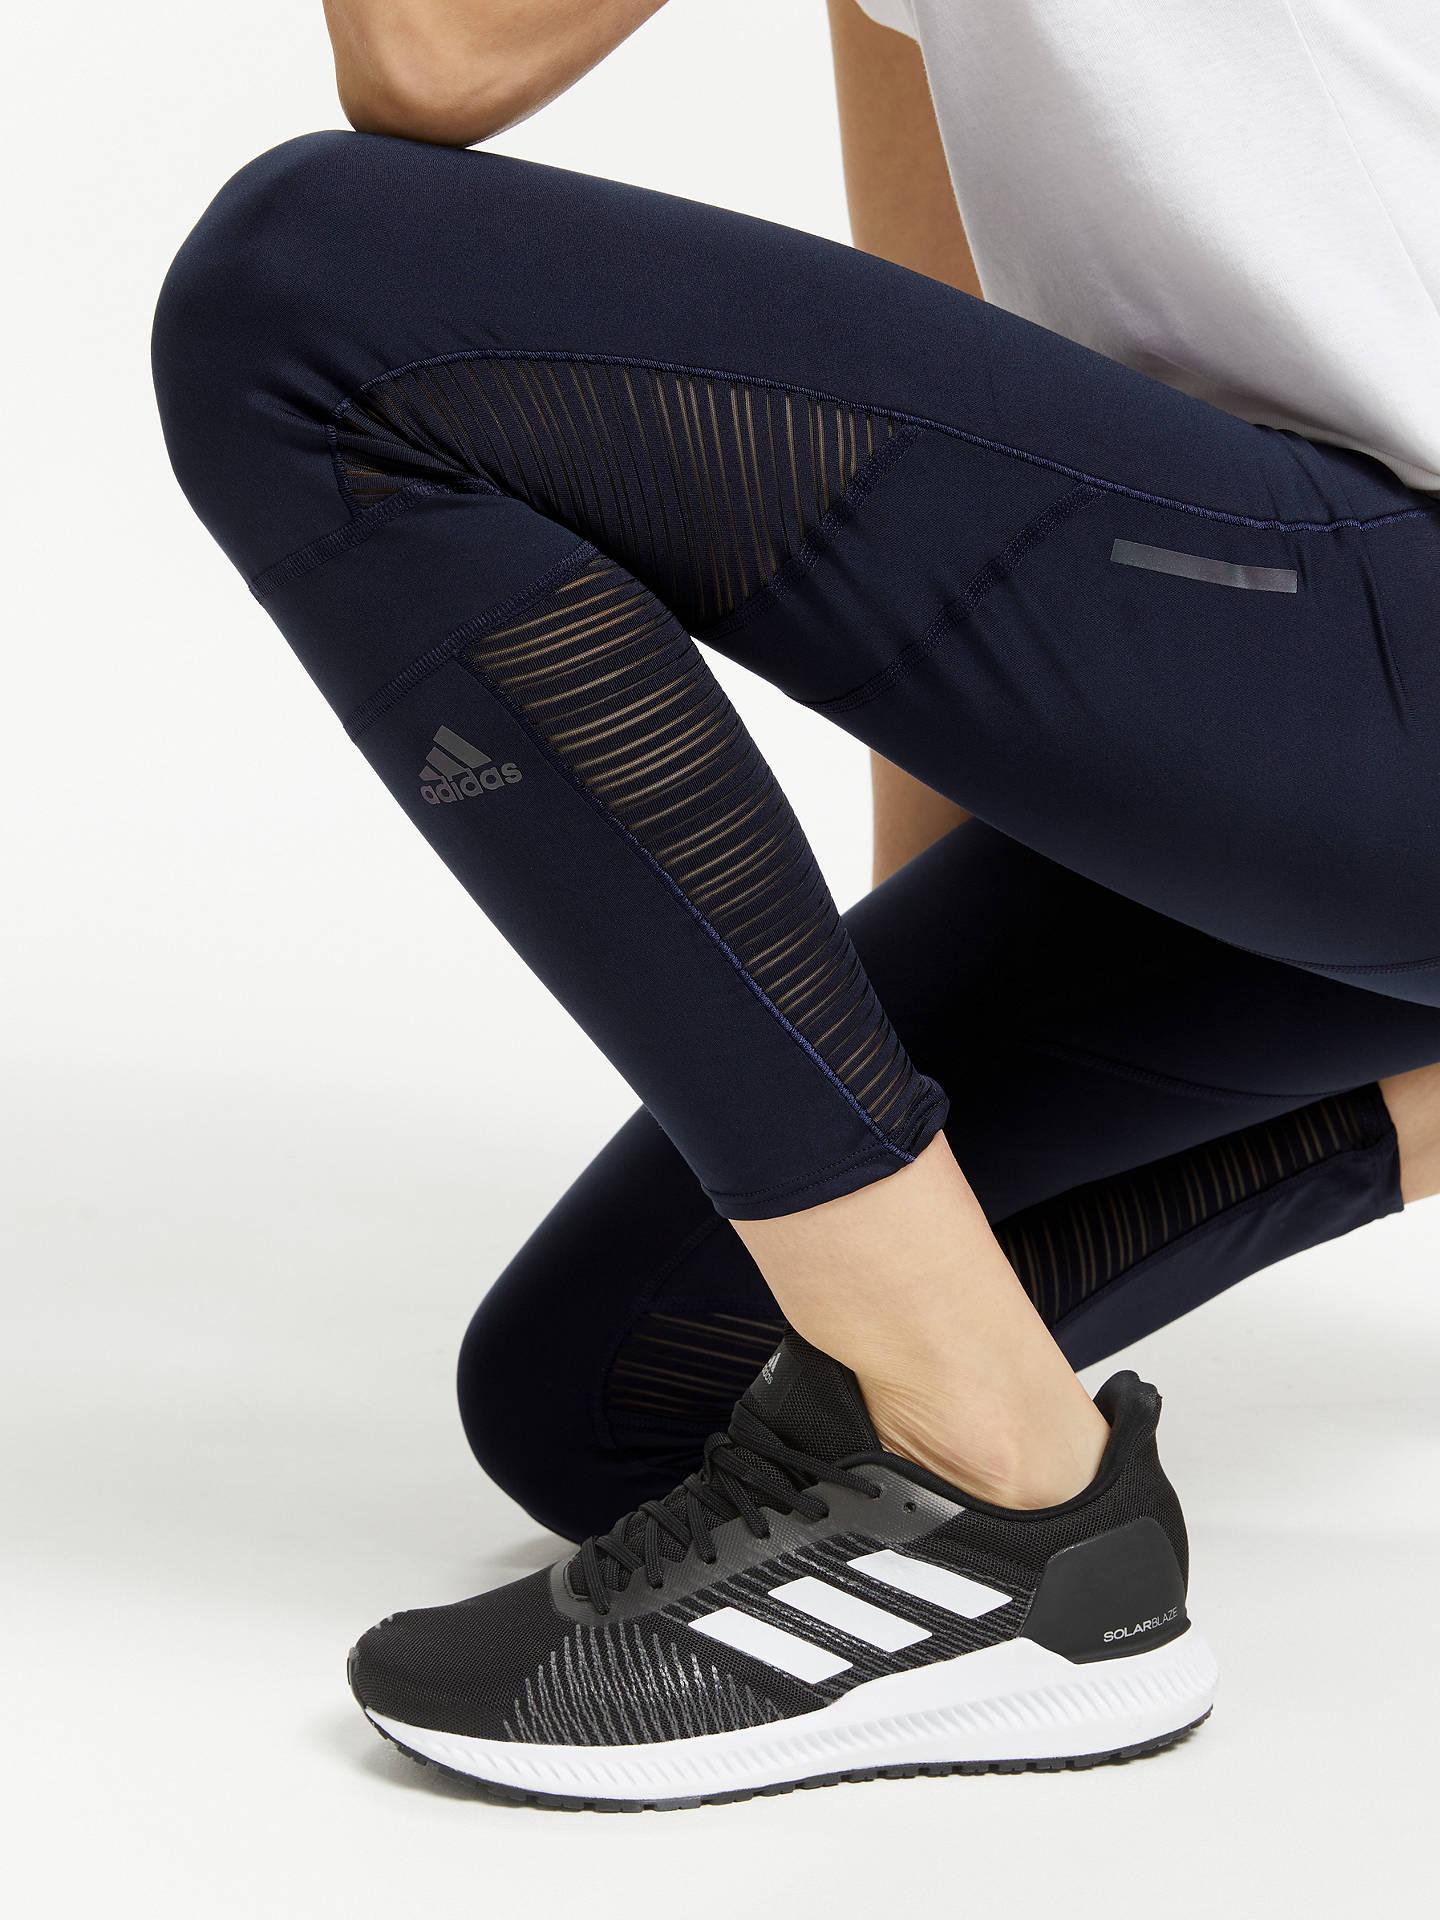 adidas How We Do 78 Running Tights at John Lewis & Partners